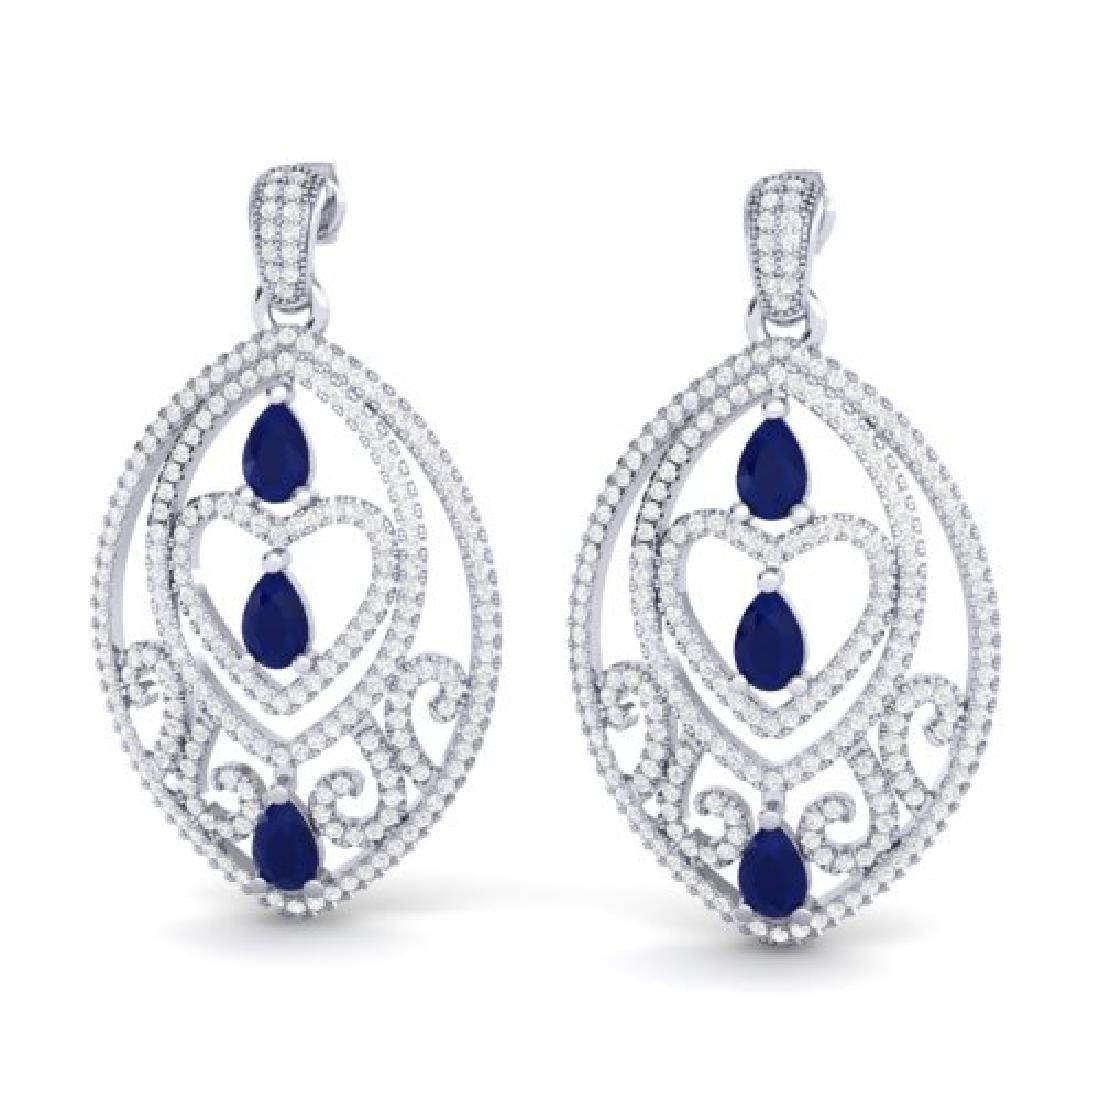 7 CTW Sapphire & Micro Pave VS/SI Diamond Heart